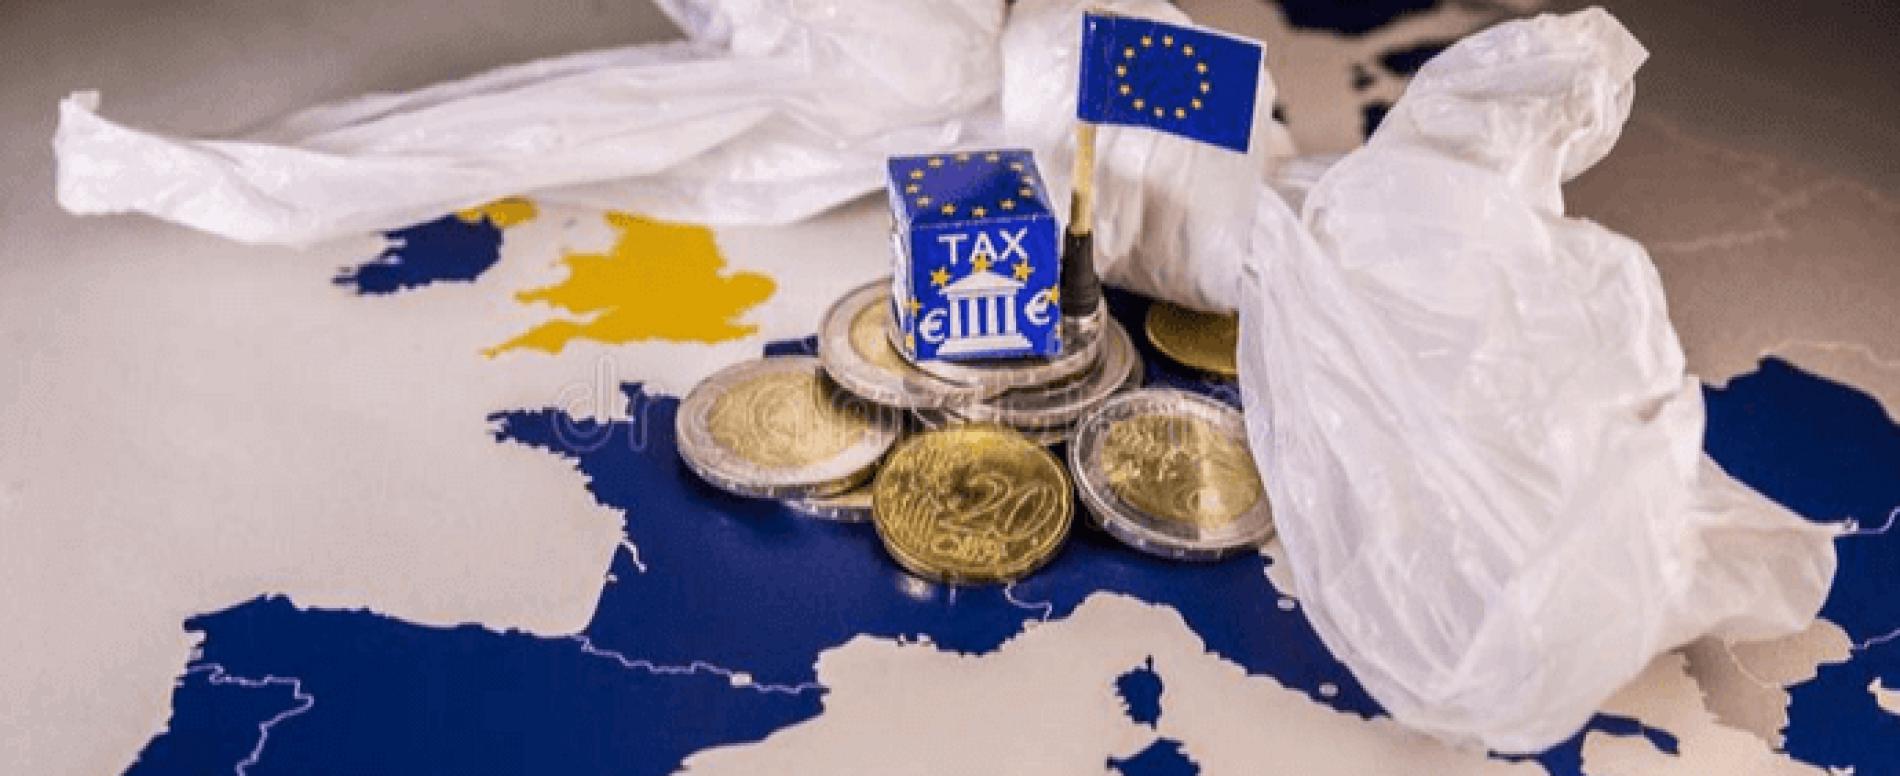 Ipotesi tassa europea sulla plastica. Interviene l'EuPC